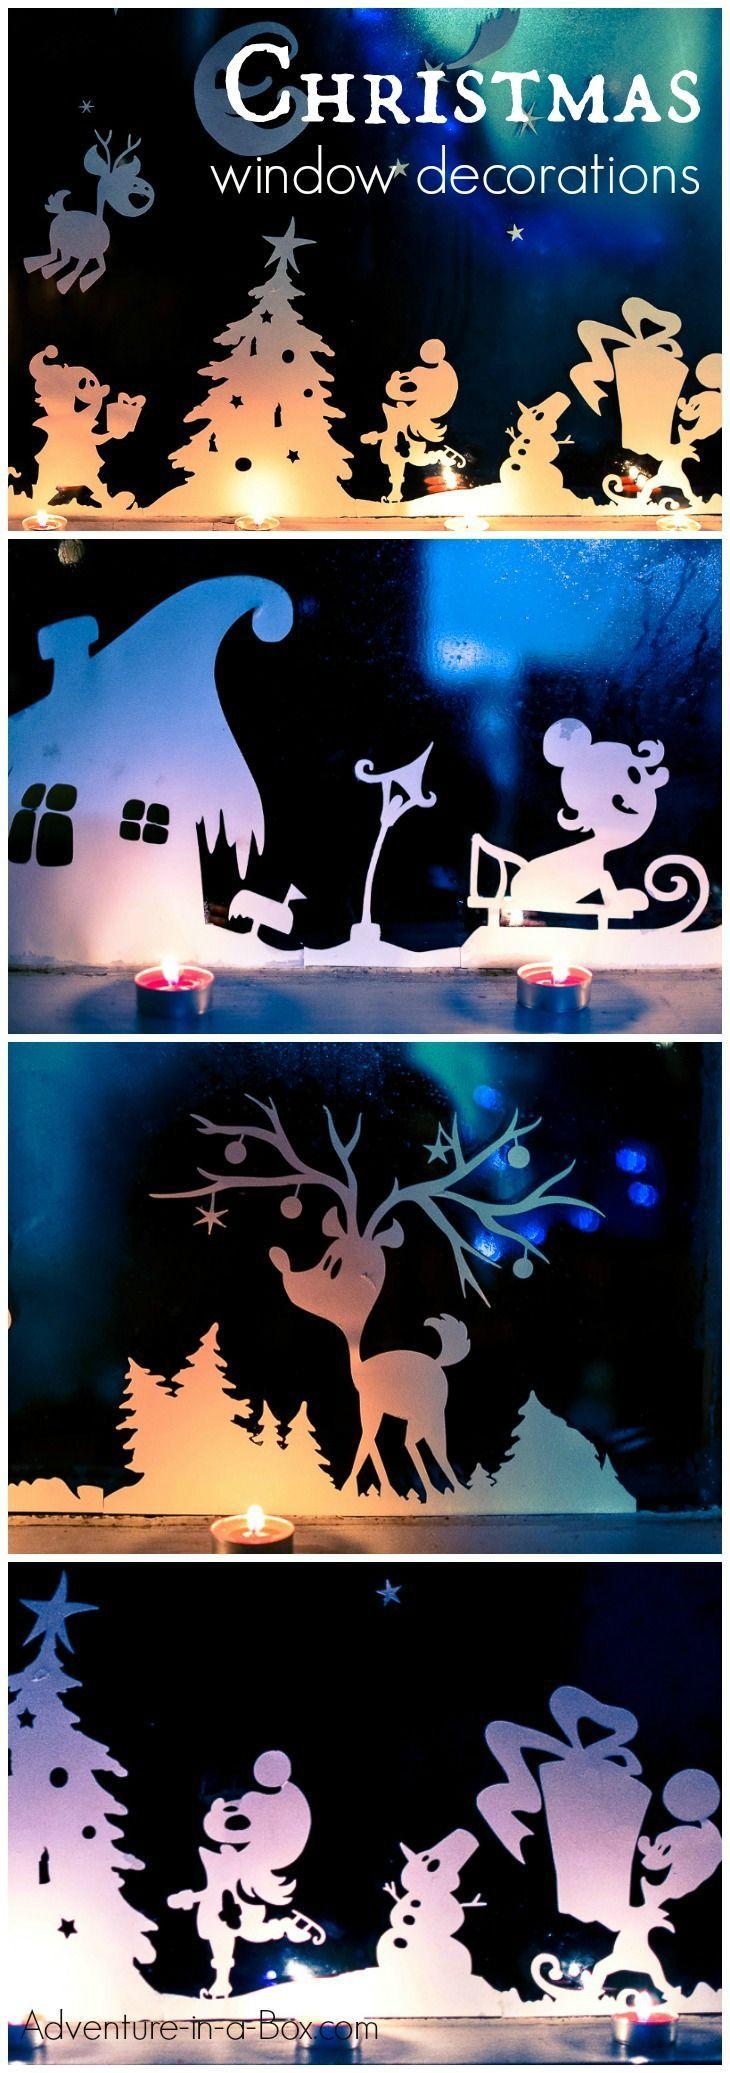 Christmas window lights decorations - Christmas Window Decorations